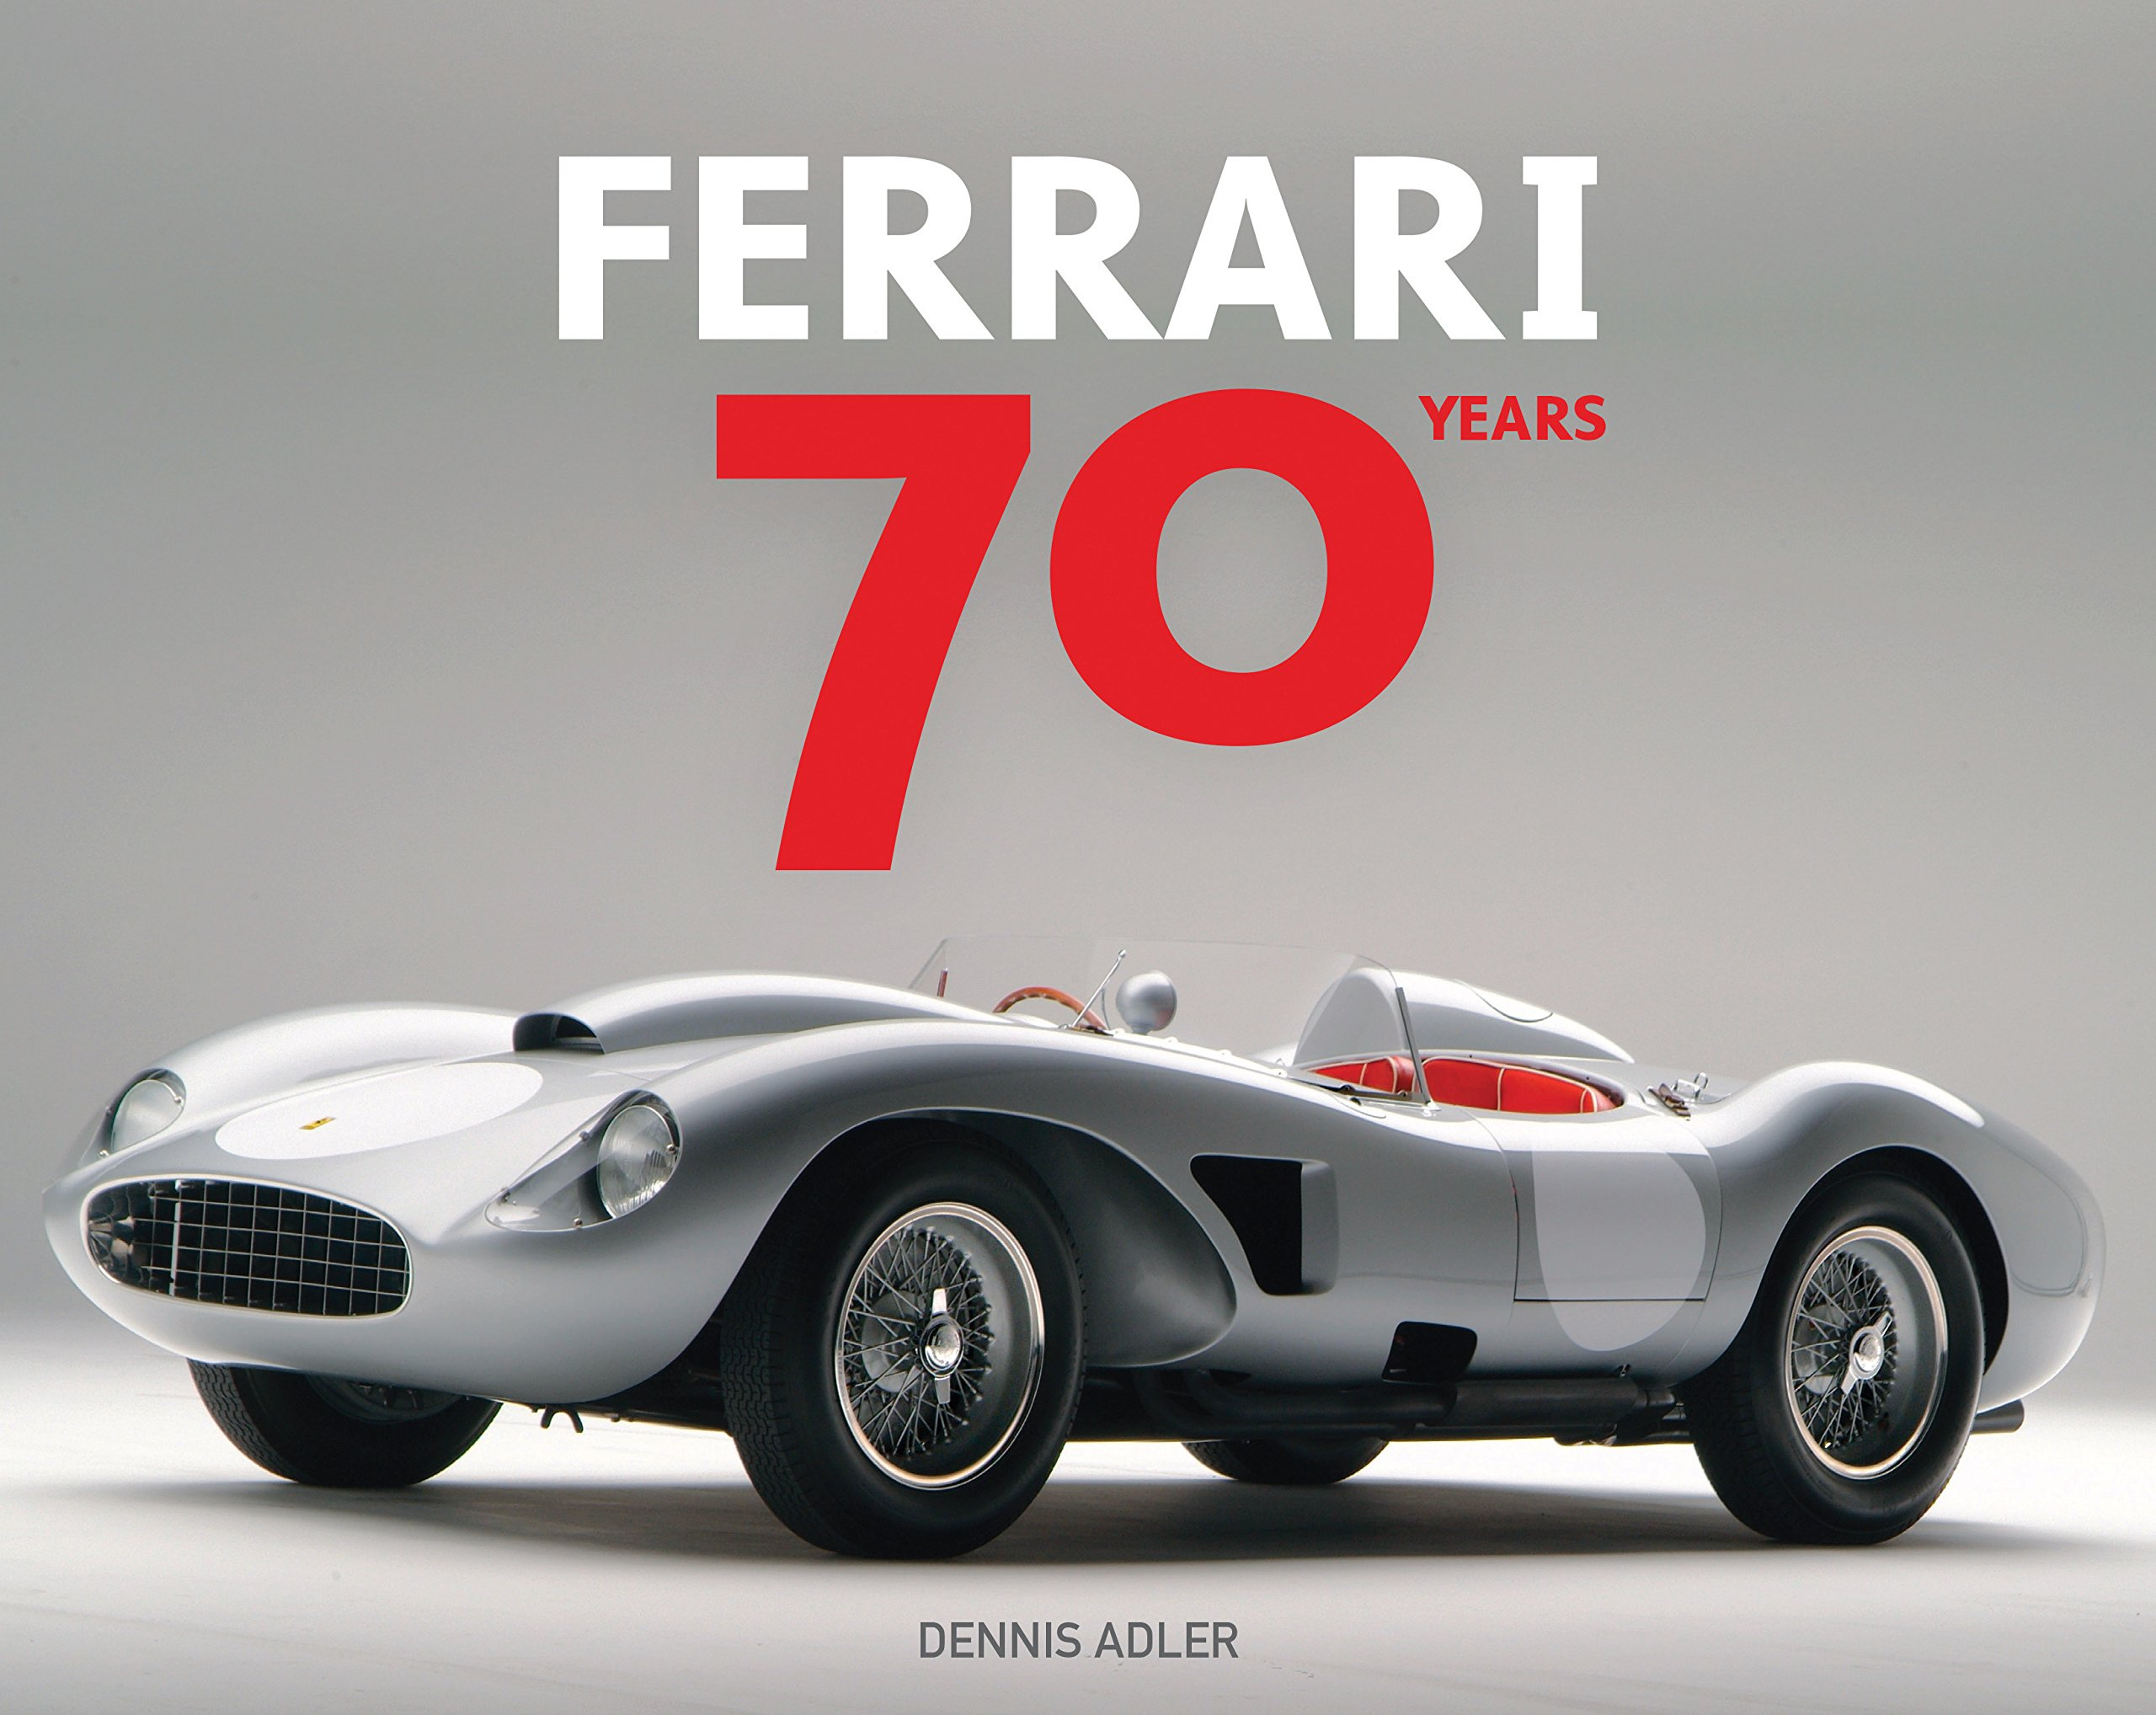 Ordinaire Ferrari 70 Years: Dennis Adler, Luigi Chinetti: 9780760351895: Amazon.com:  Books